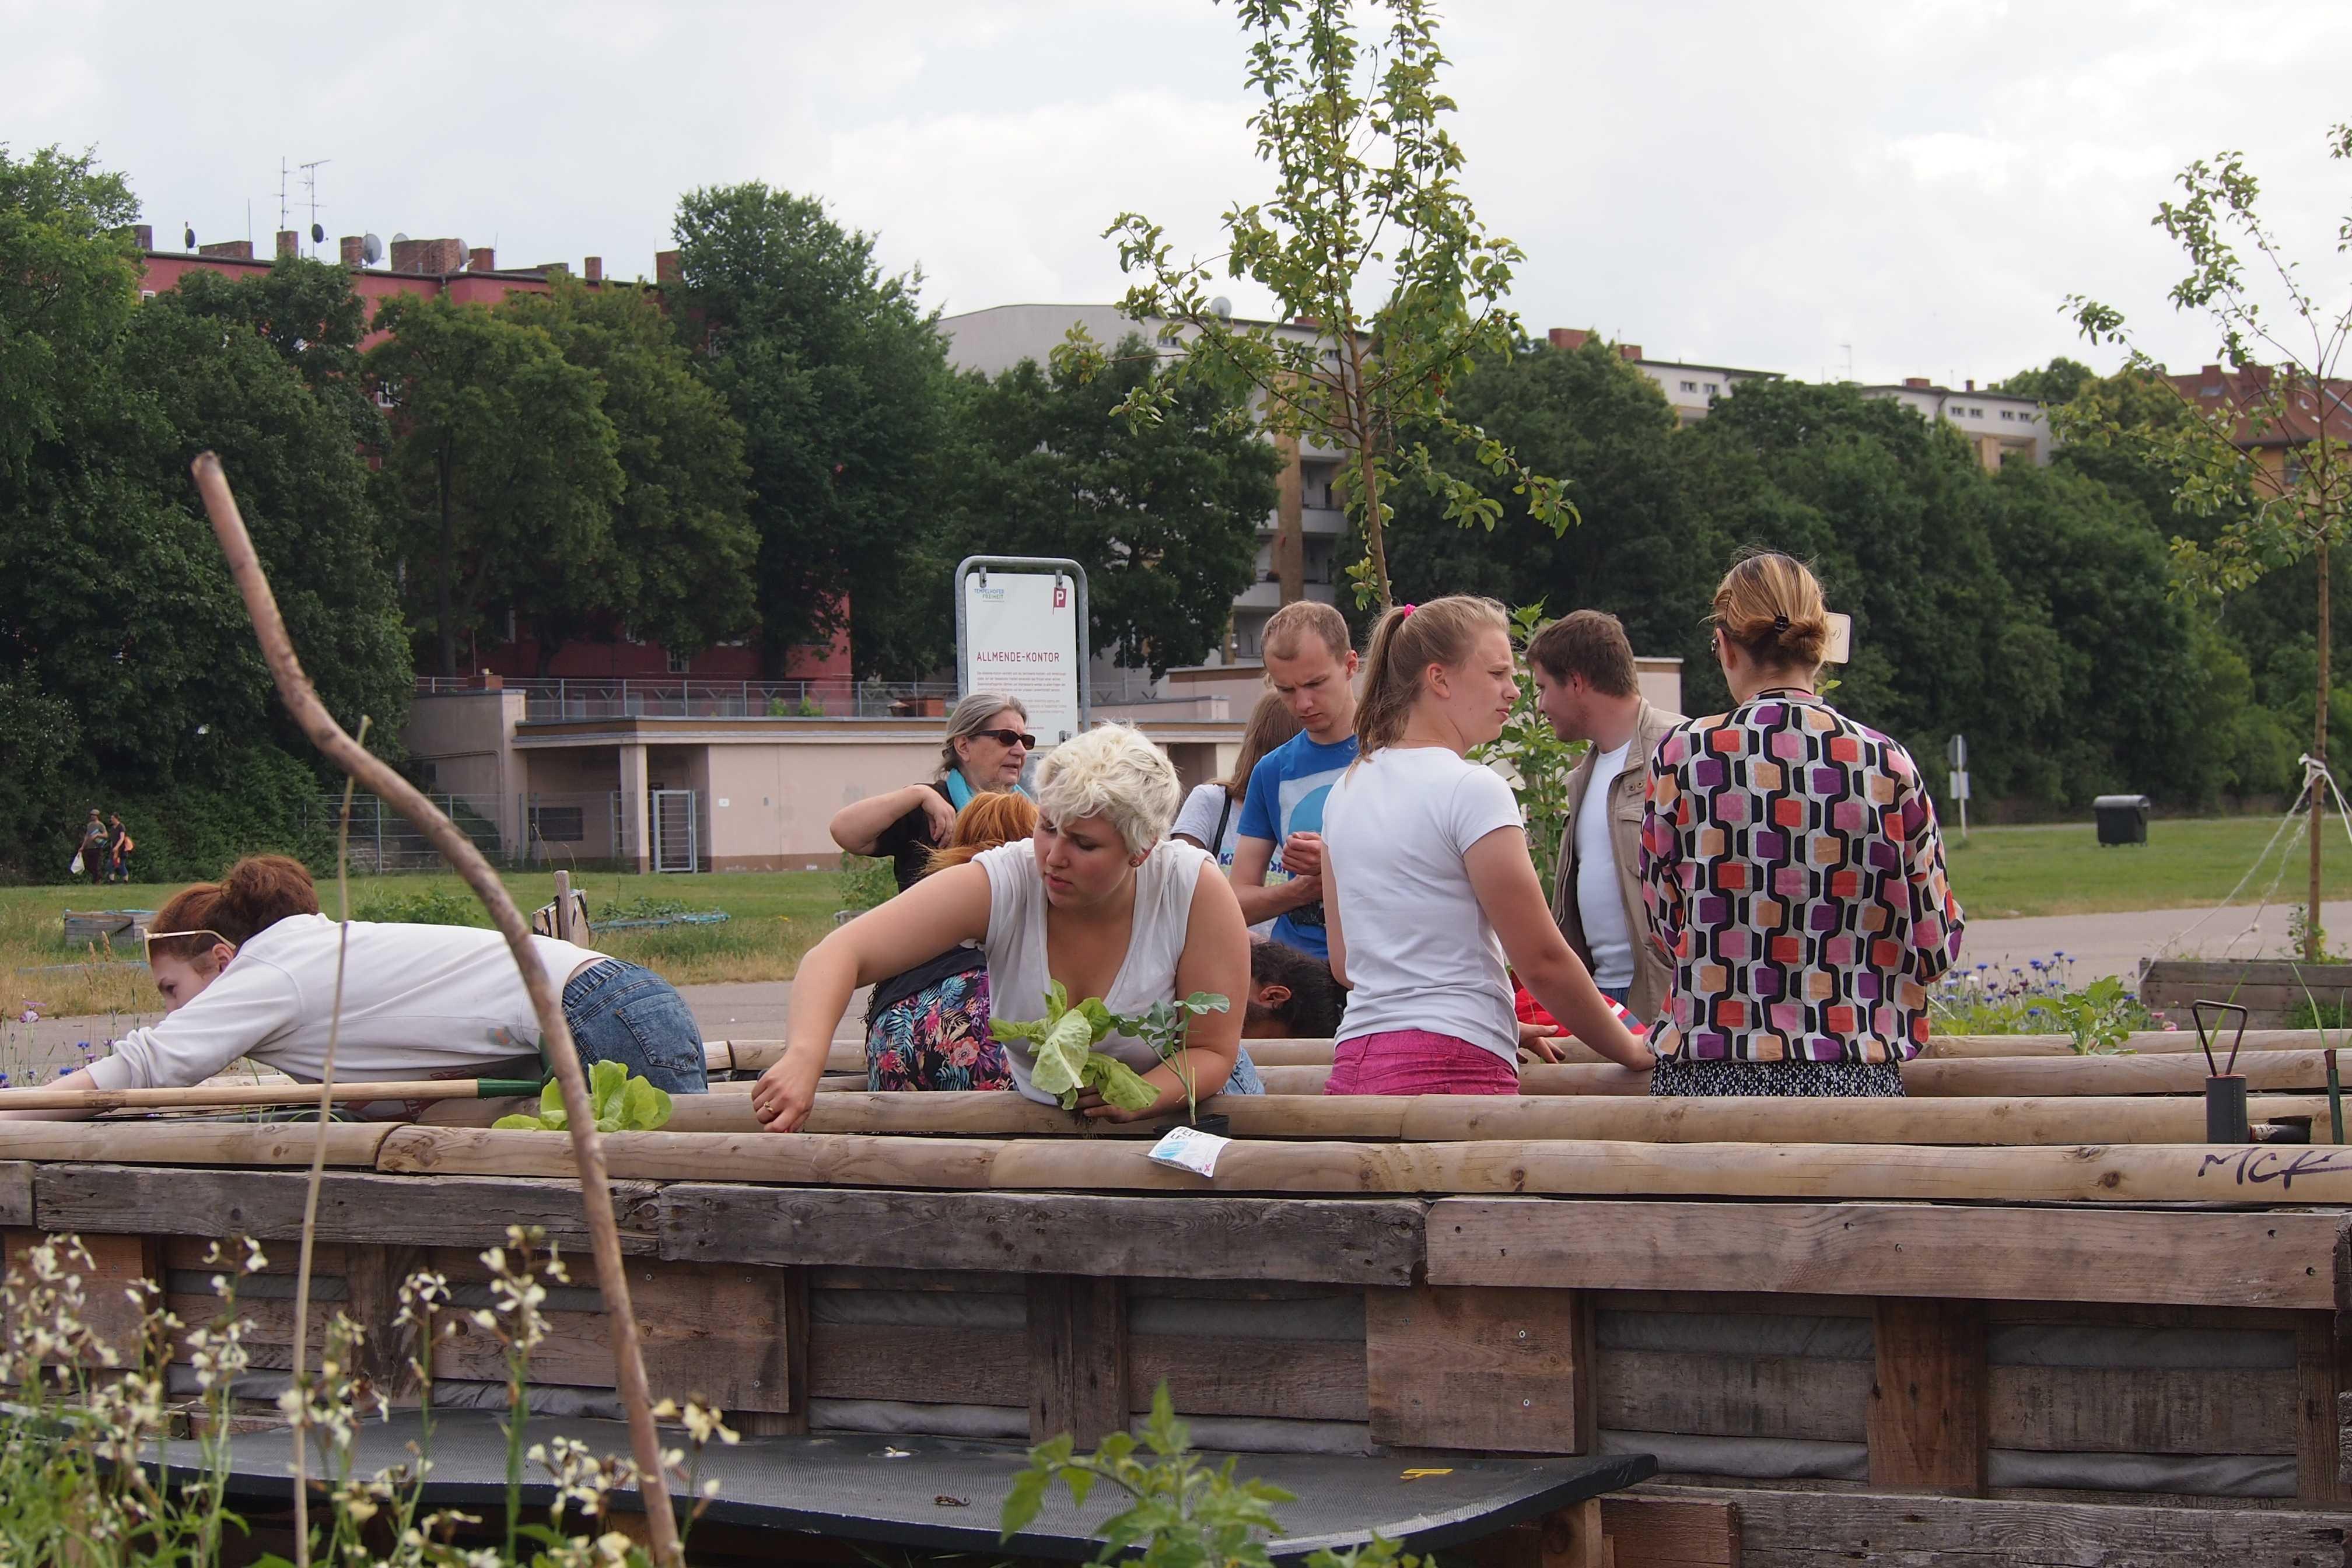 Allmende-Kontor Community Garden